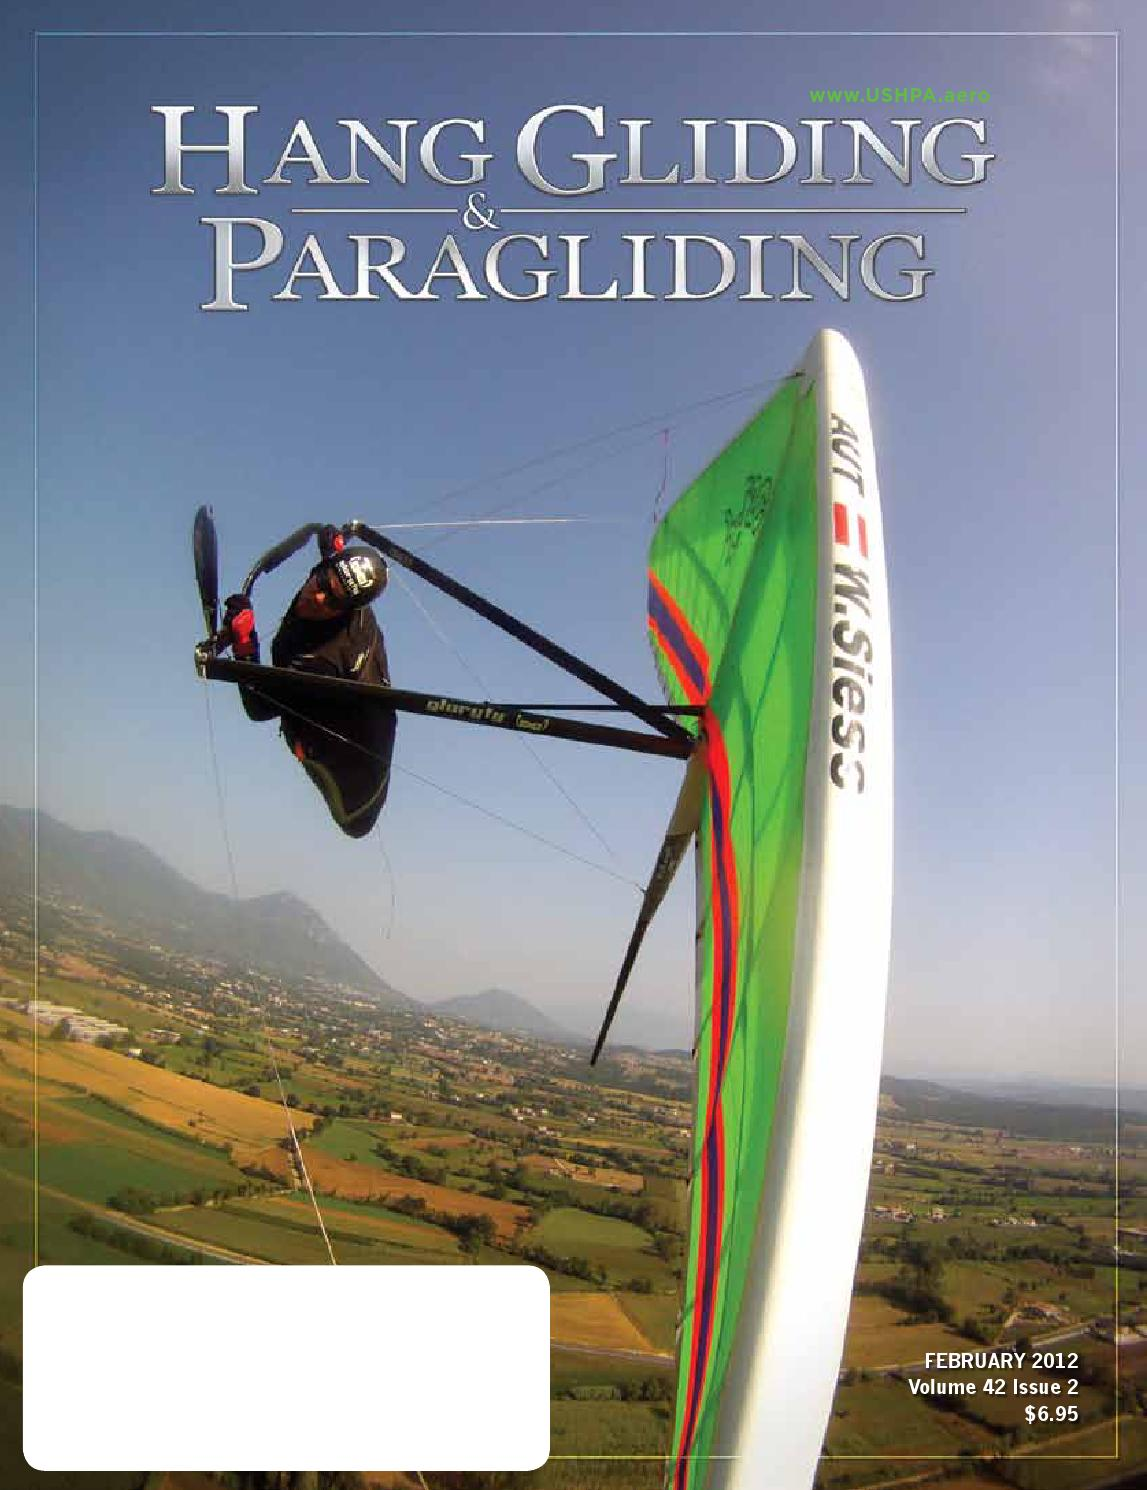 Hang Gliding & Paragliding Vol42/Iss02 Feb 2012 by US Hang